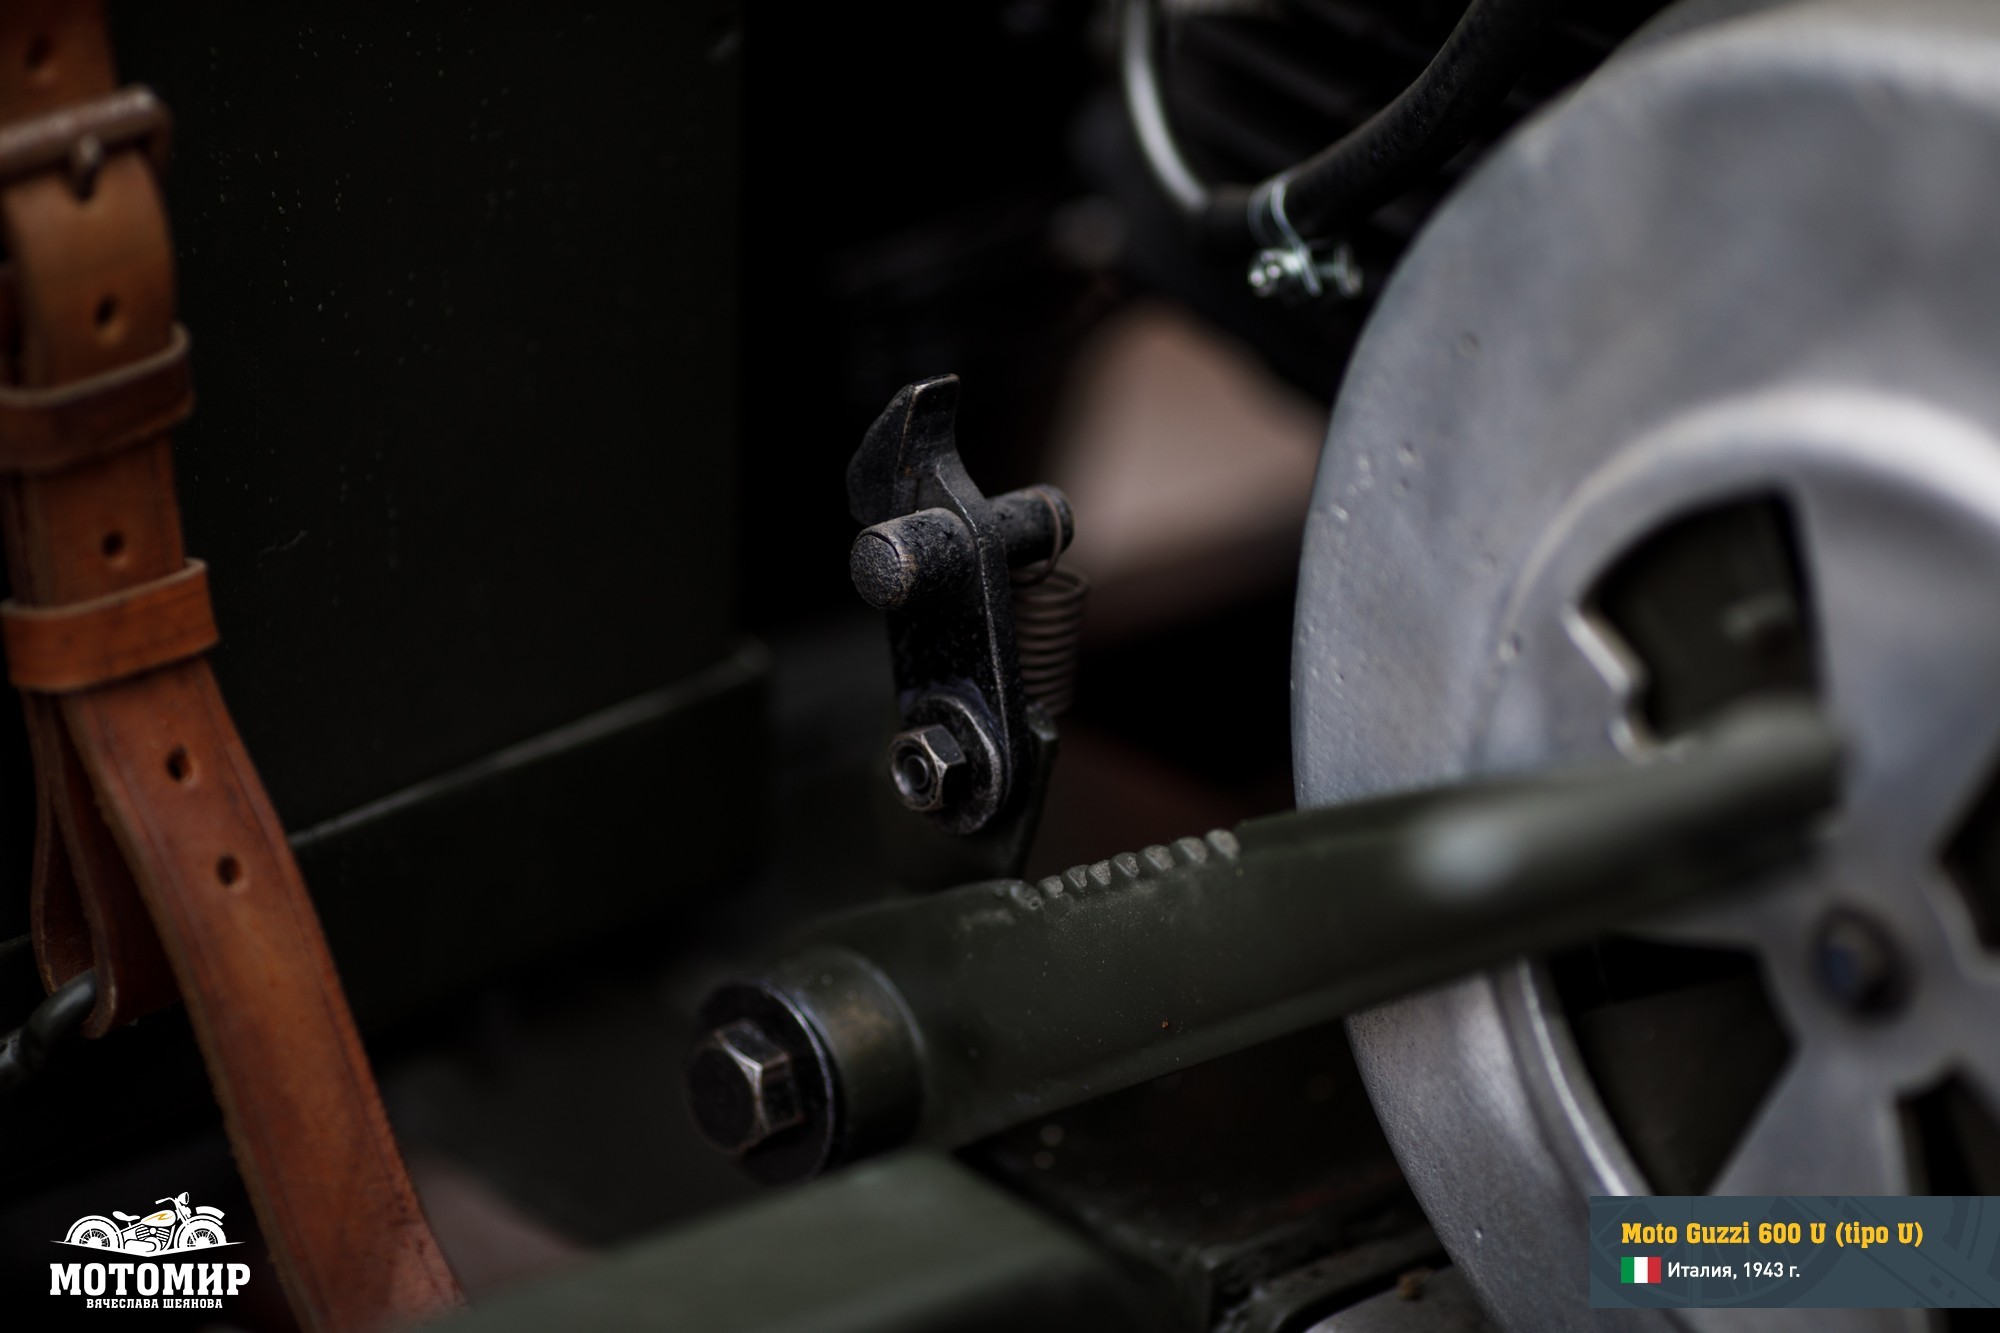 moto-guzzi-600-u-web-30